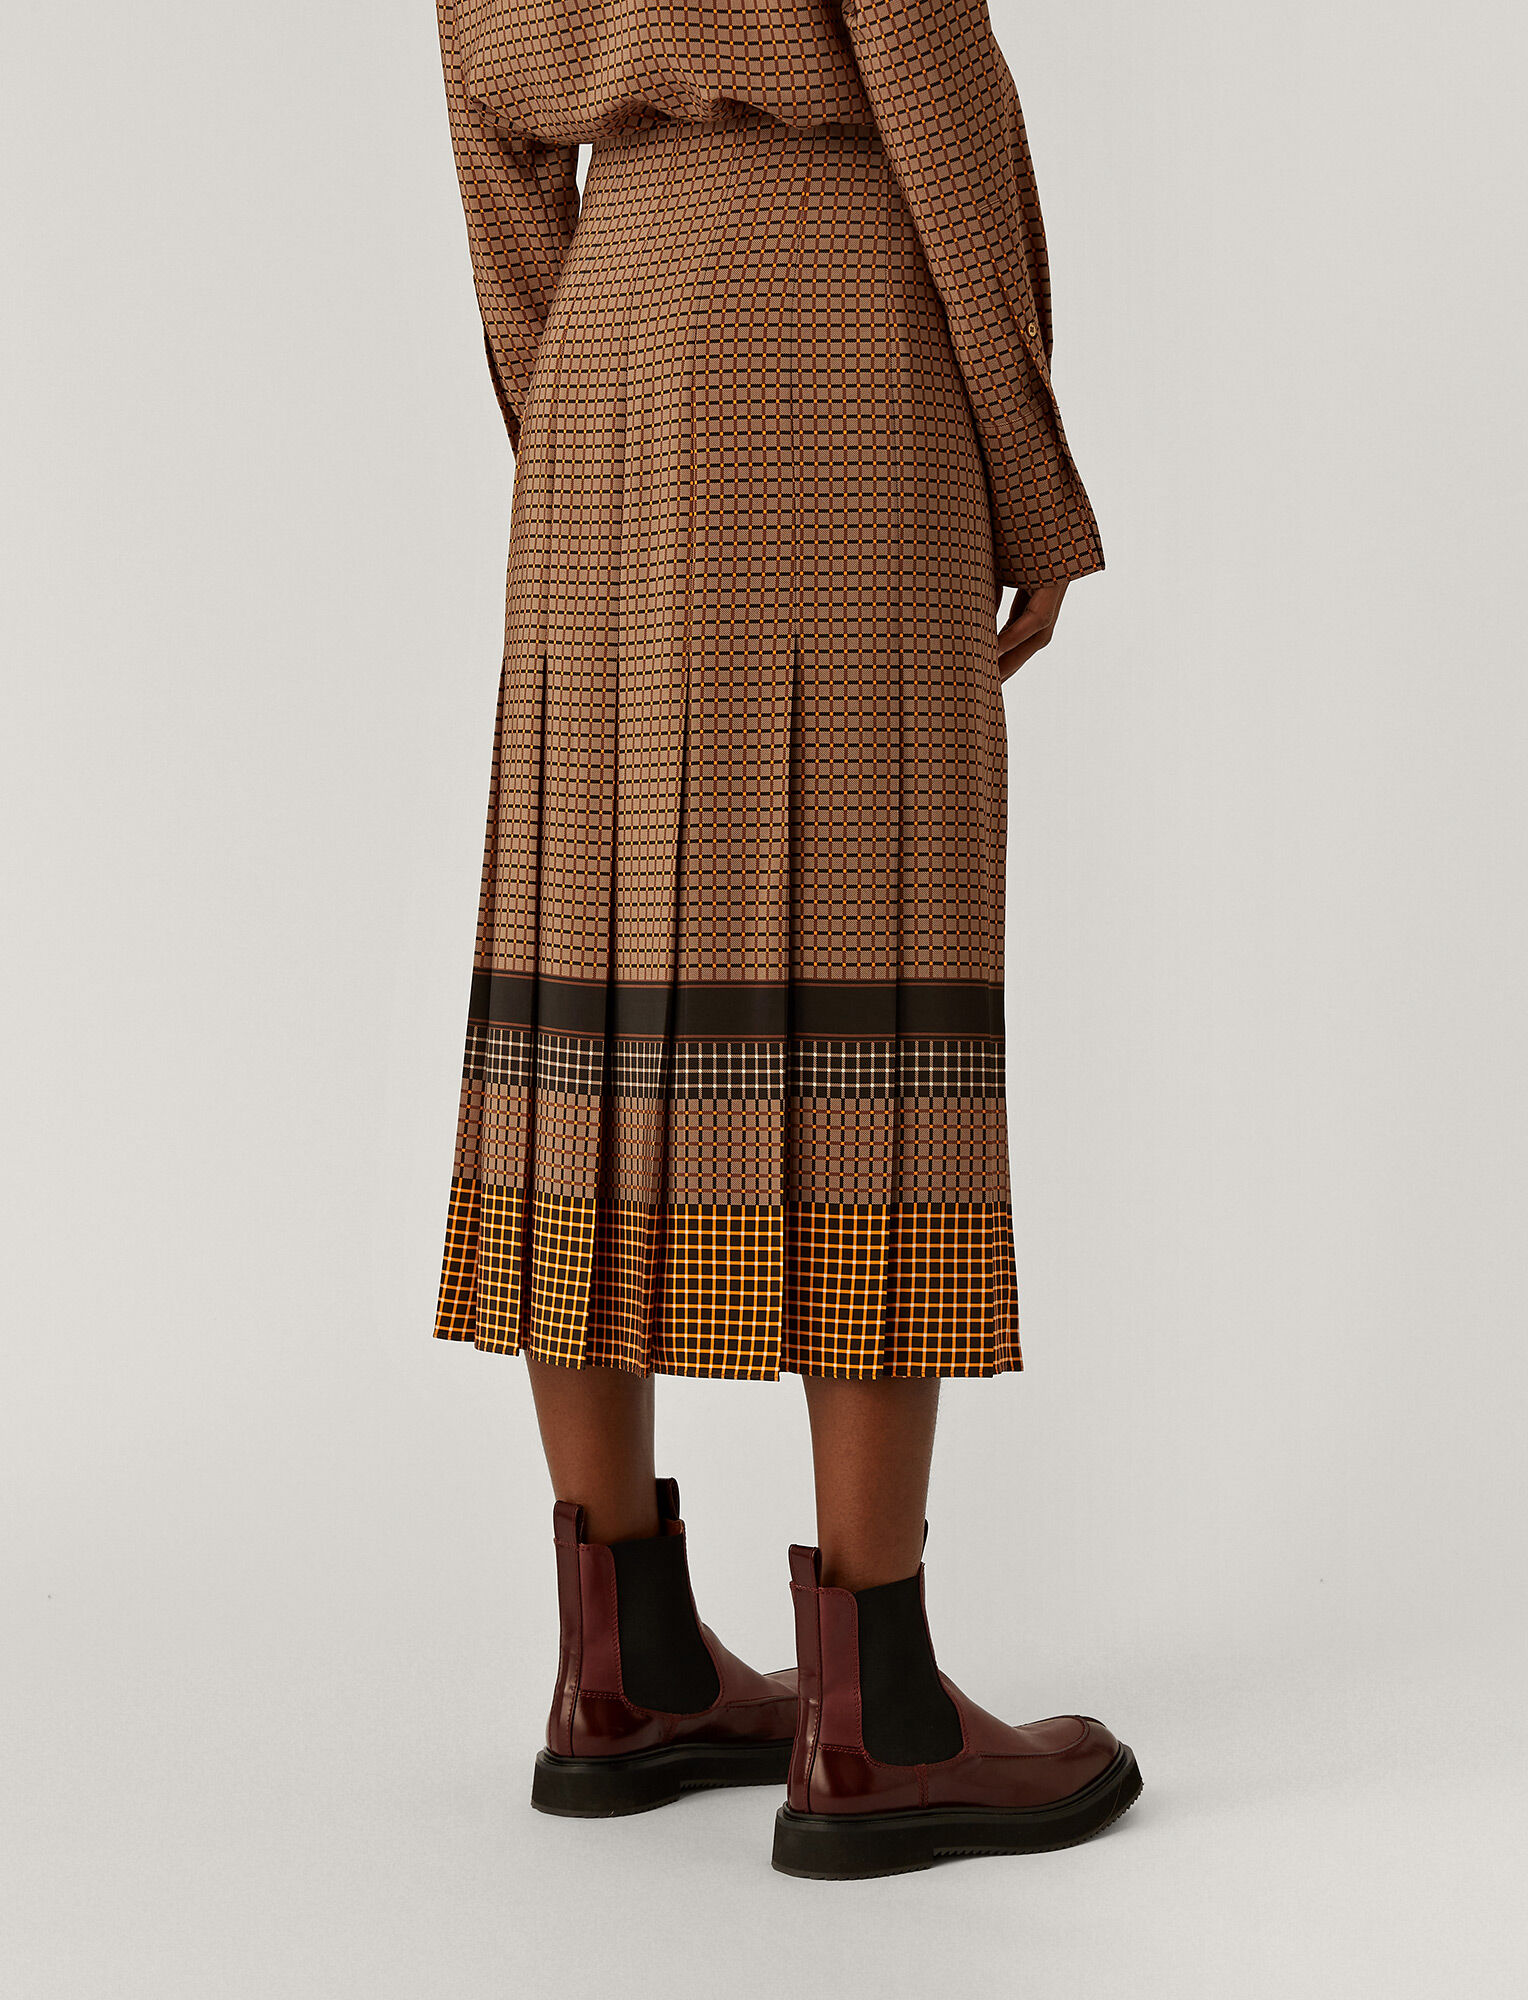 Joseph, Saria Silk Plaid Skirt, in Saddle/Black